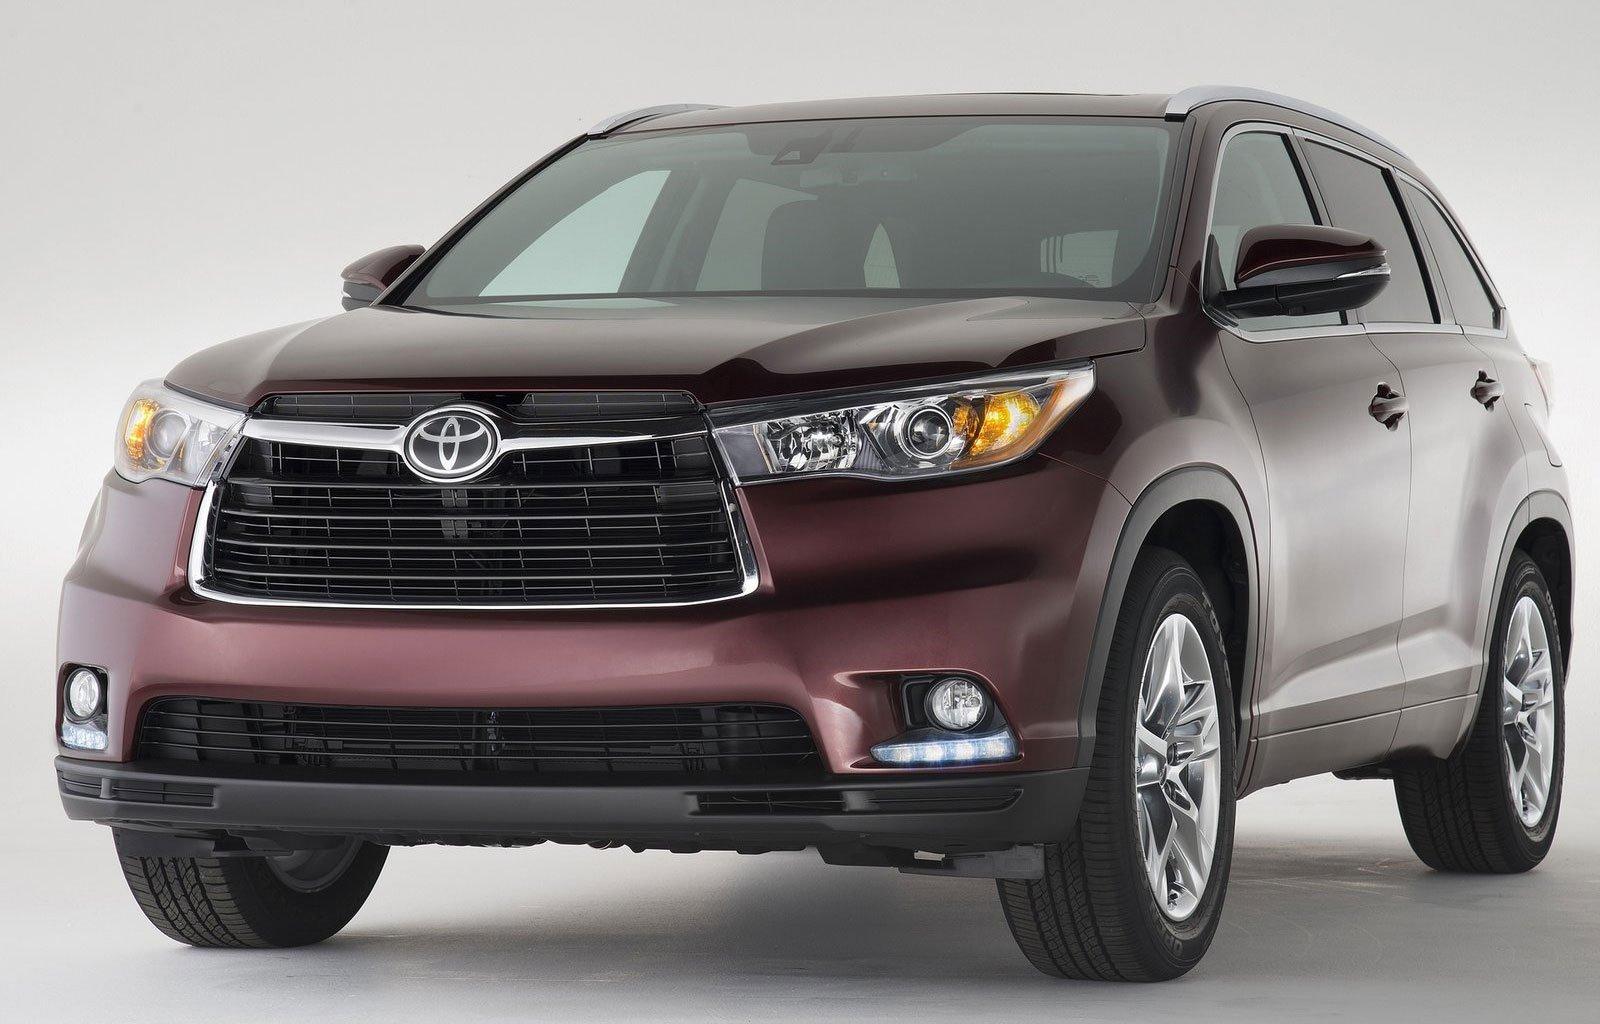 Toyota Highlander Third Gen Suv Debuts In Nyc